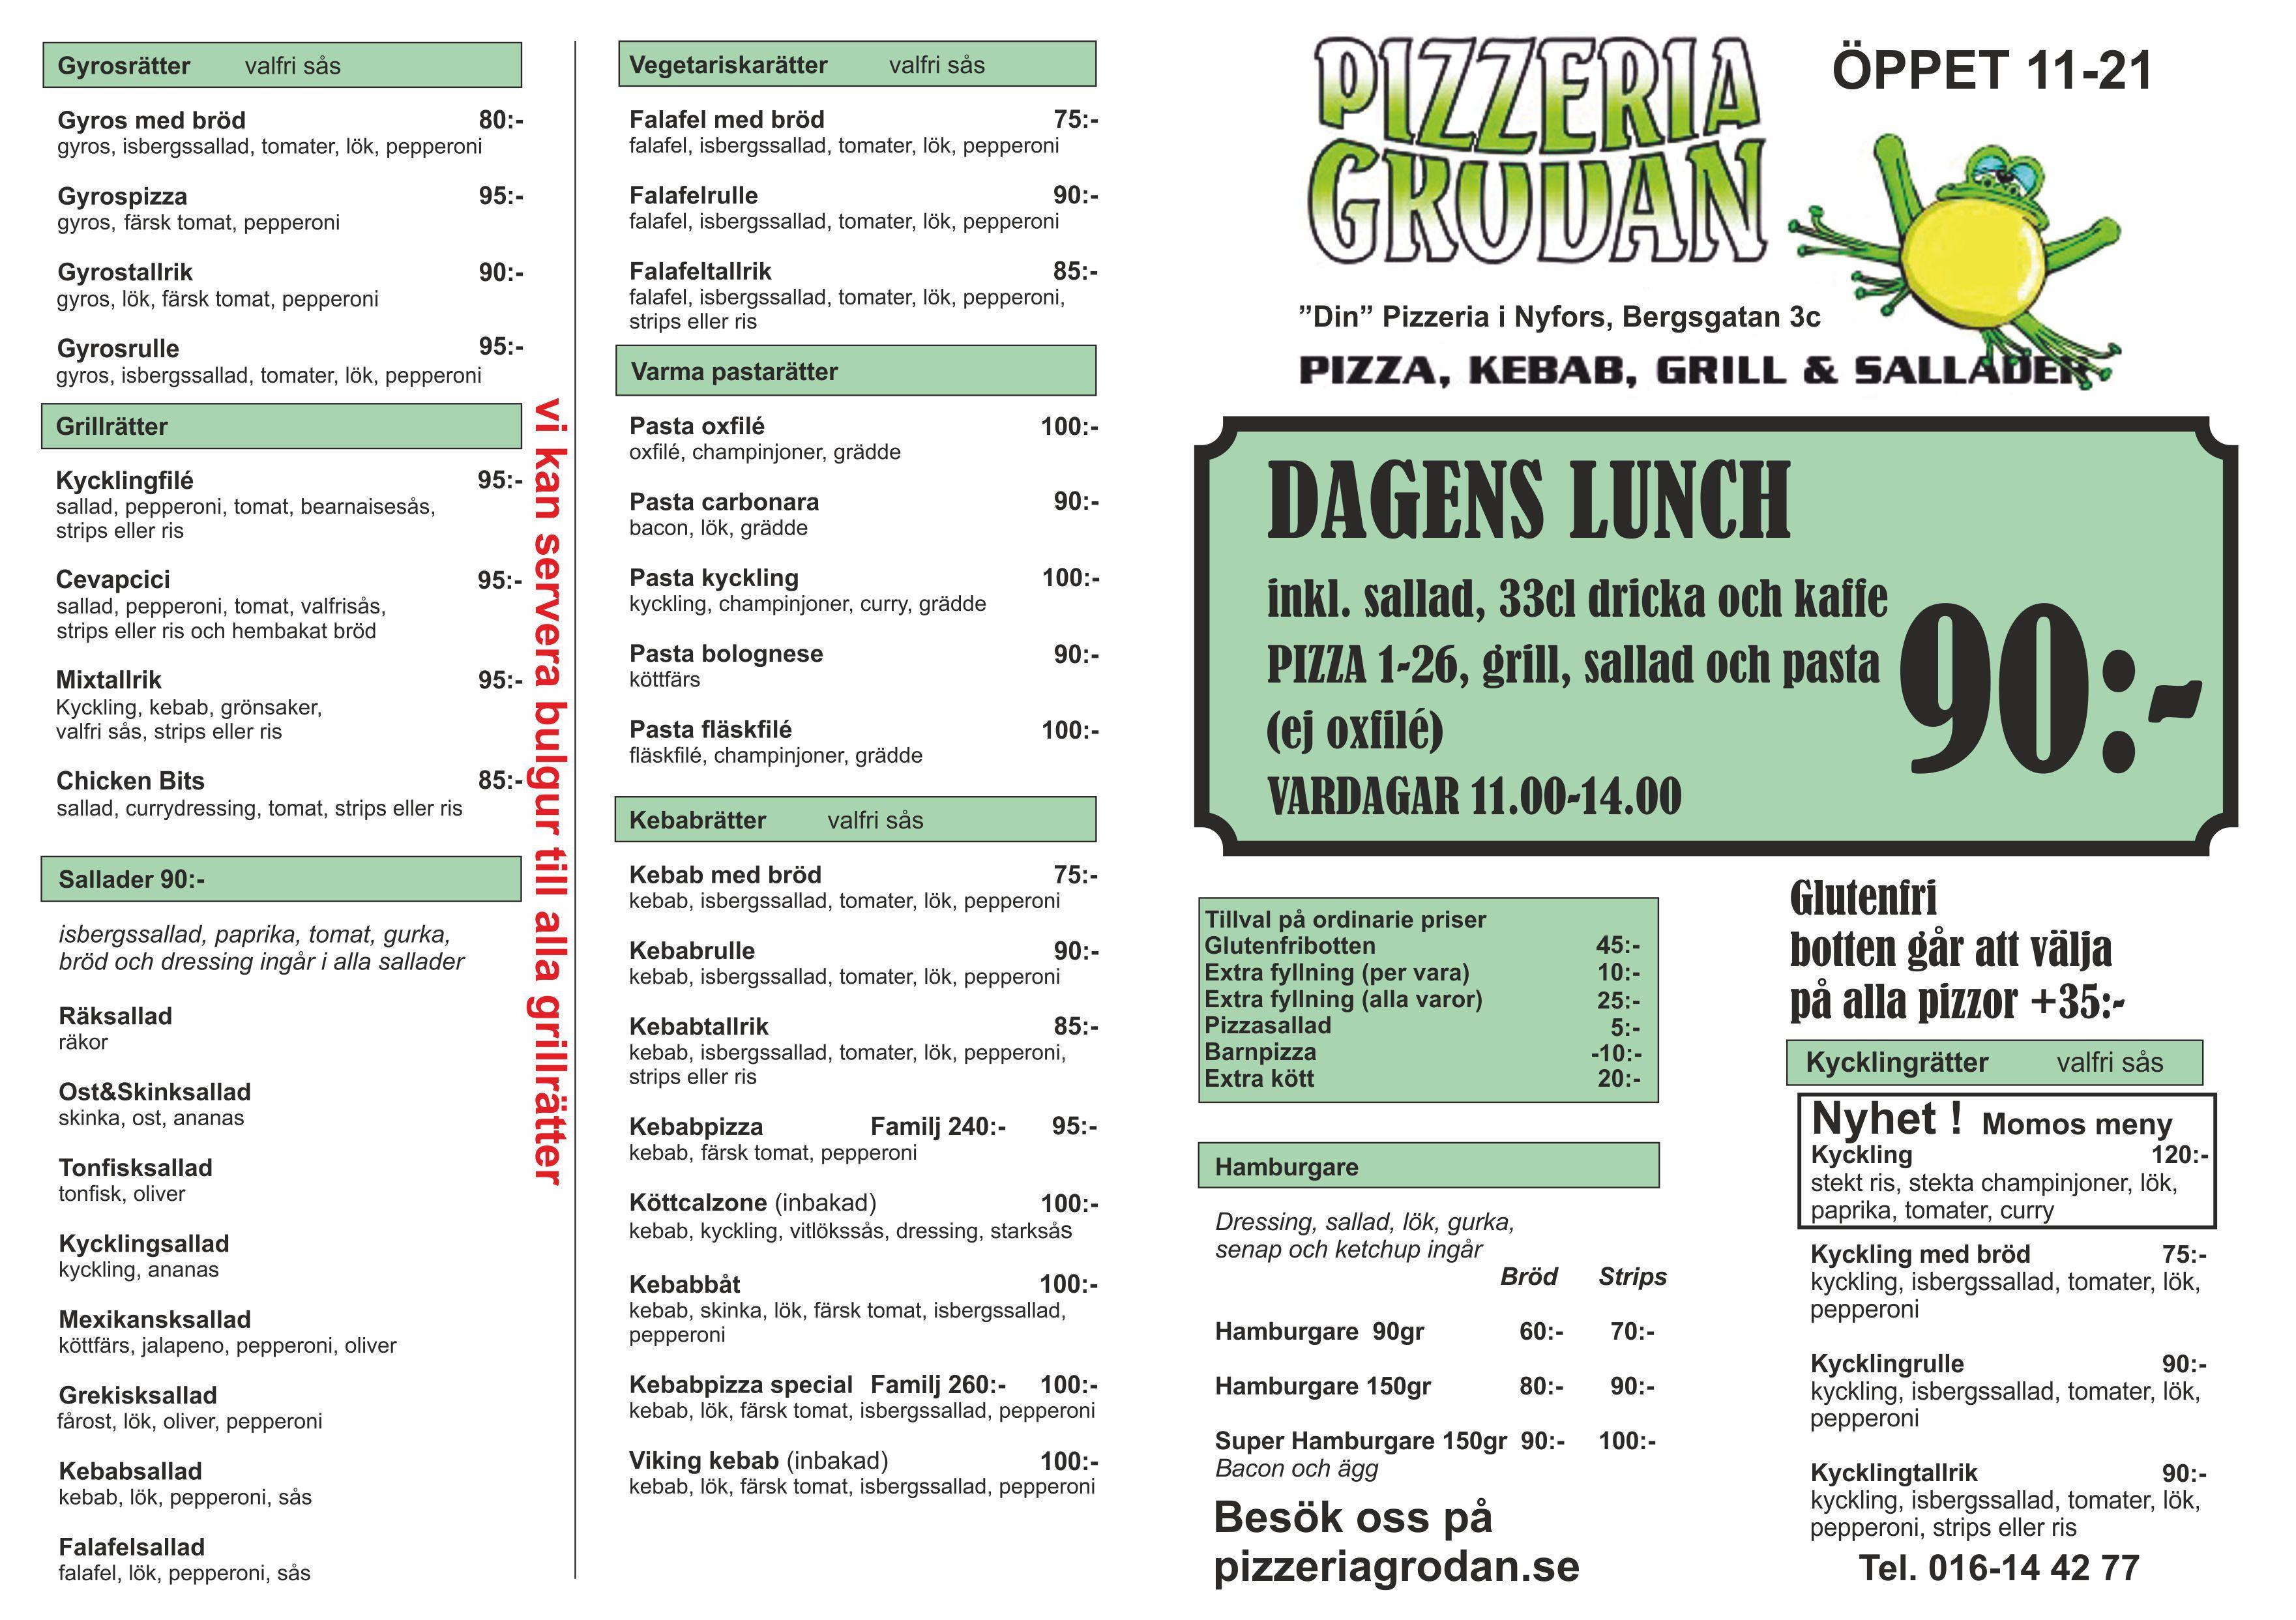 pizzeria grodan nyfors